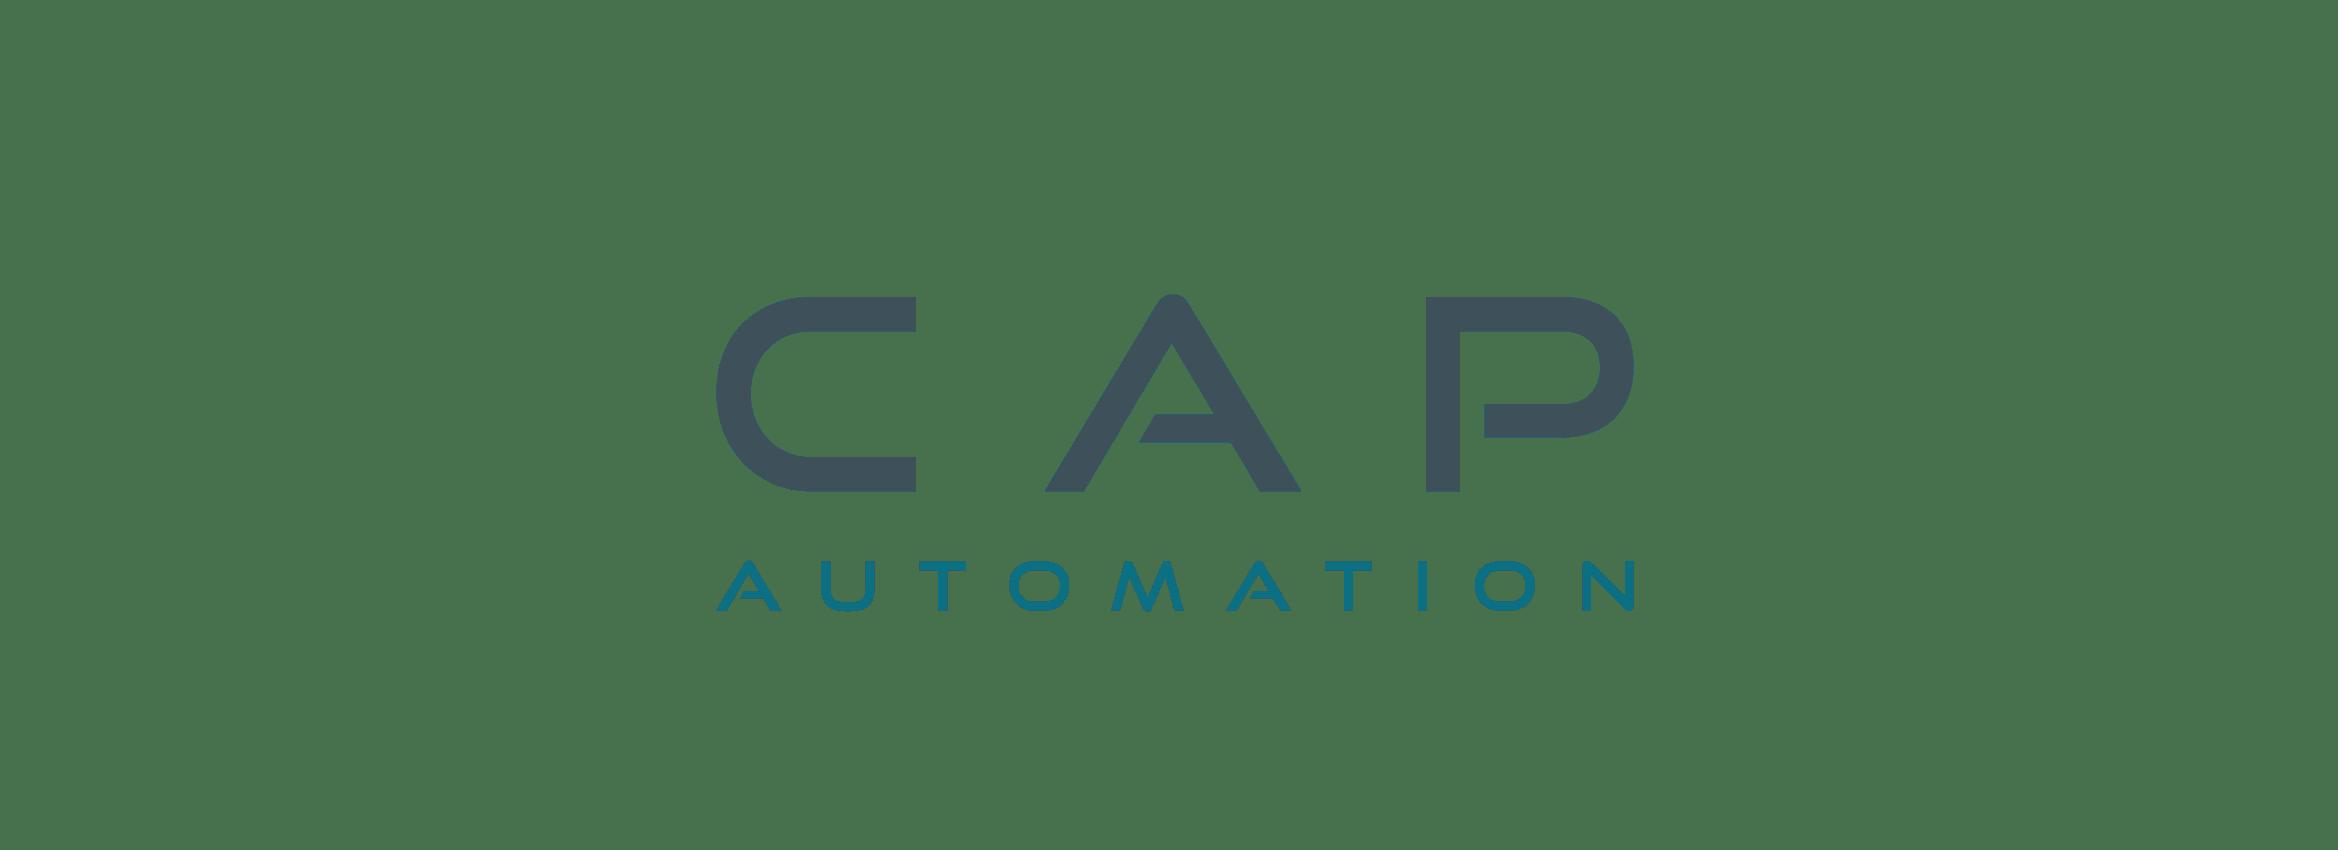 CAP Automation GmbH